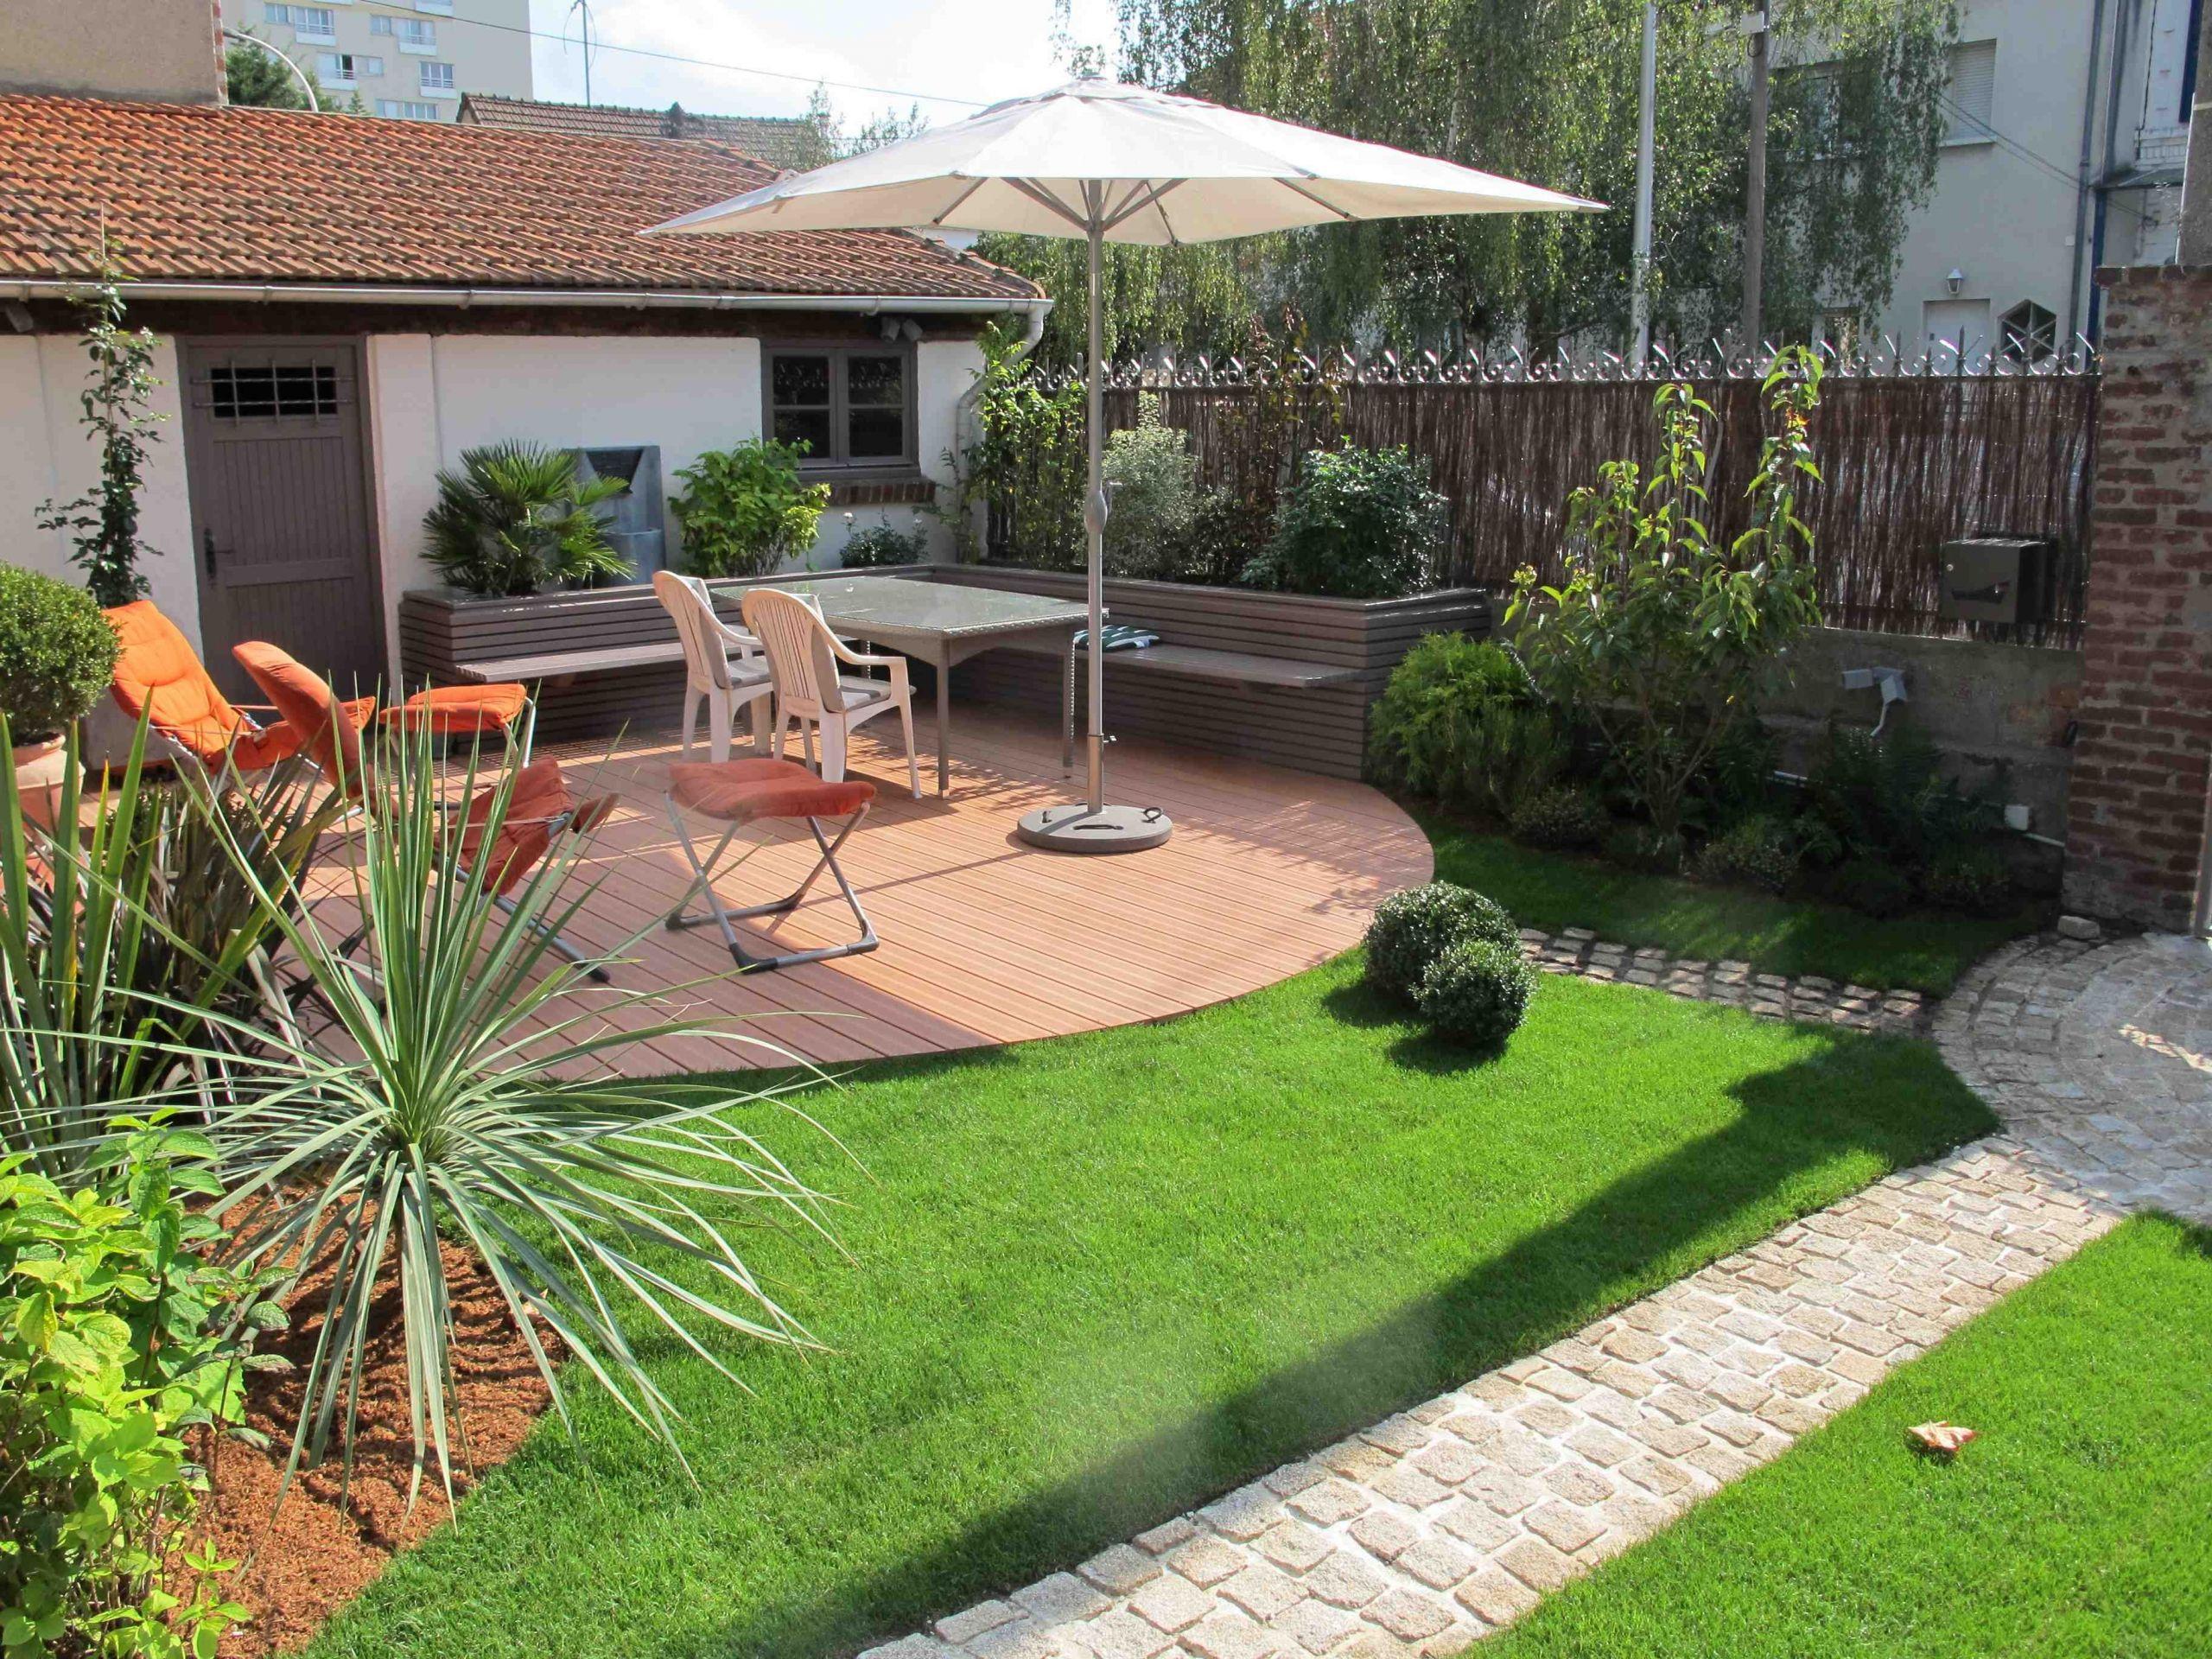 Aménagement Jardin Terrasse Amenagement Jardin Et Terrasse ... encequiconcerne Aménagement Du Jardin Photo